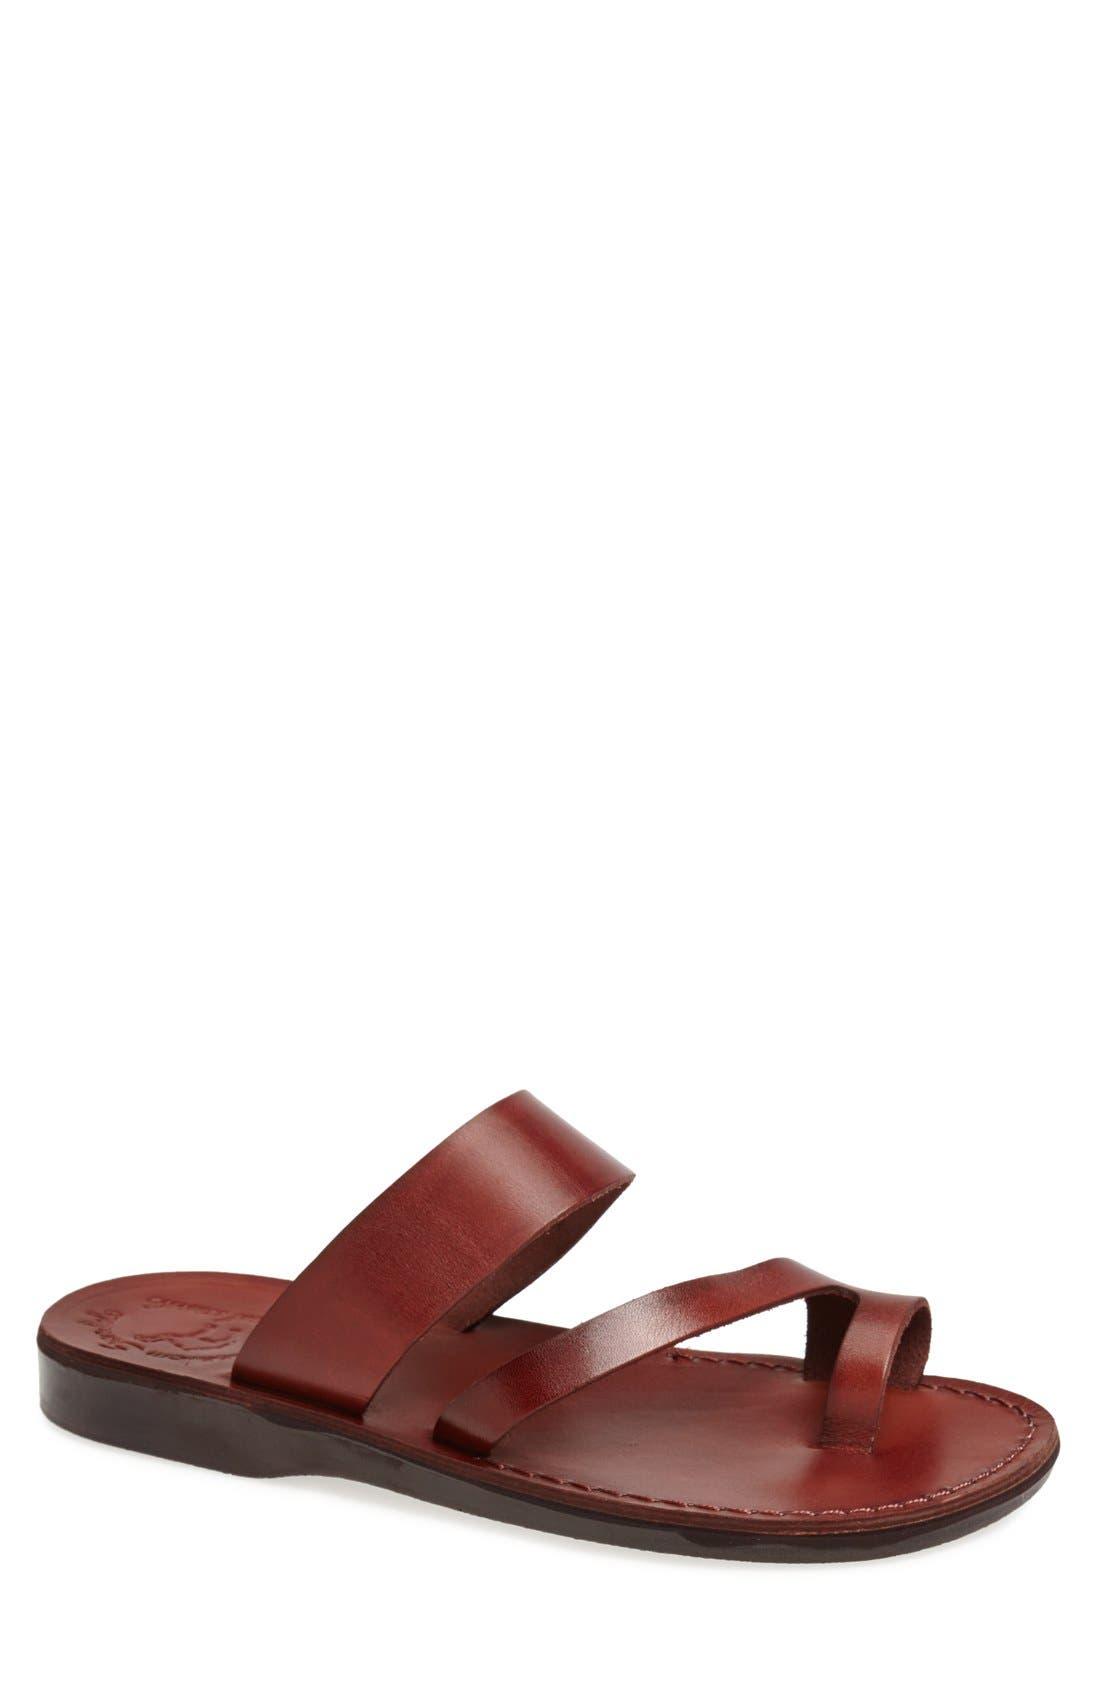 'Zohar' Leather Sandal,                         Main,                         color, BROWN